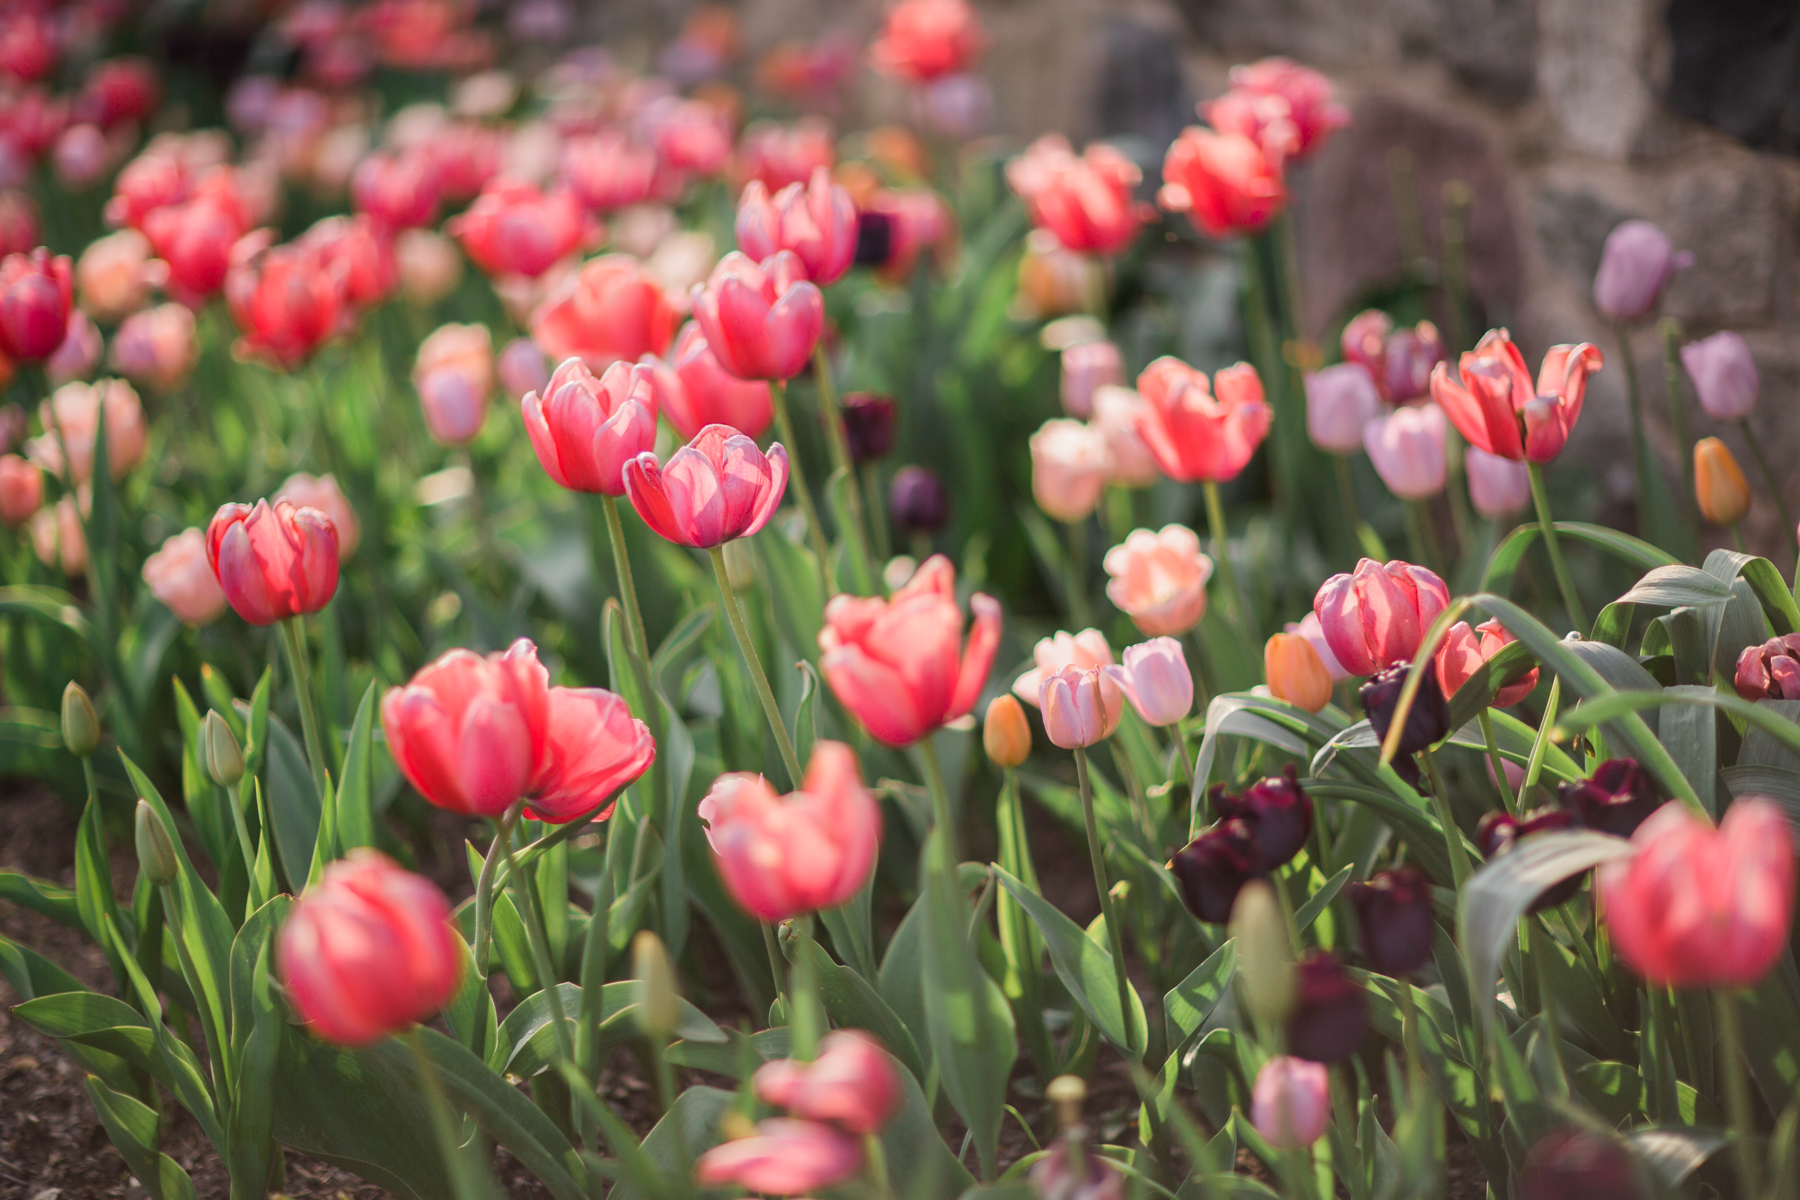 best flower fields of instagram, MOTHERS DAY, GIFT ,EVENING, SANDALS, NOTJESSFASHION, NYC, Top Fashion Blogger, Lifestyle Blogger, Travel Blogger // Notjessfashion.com